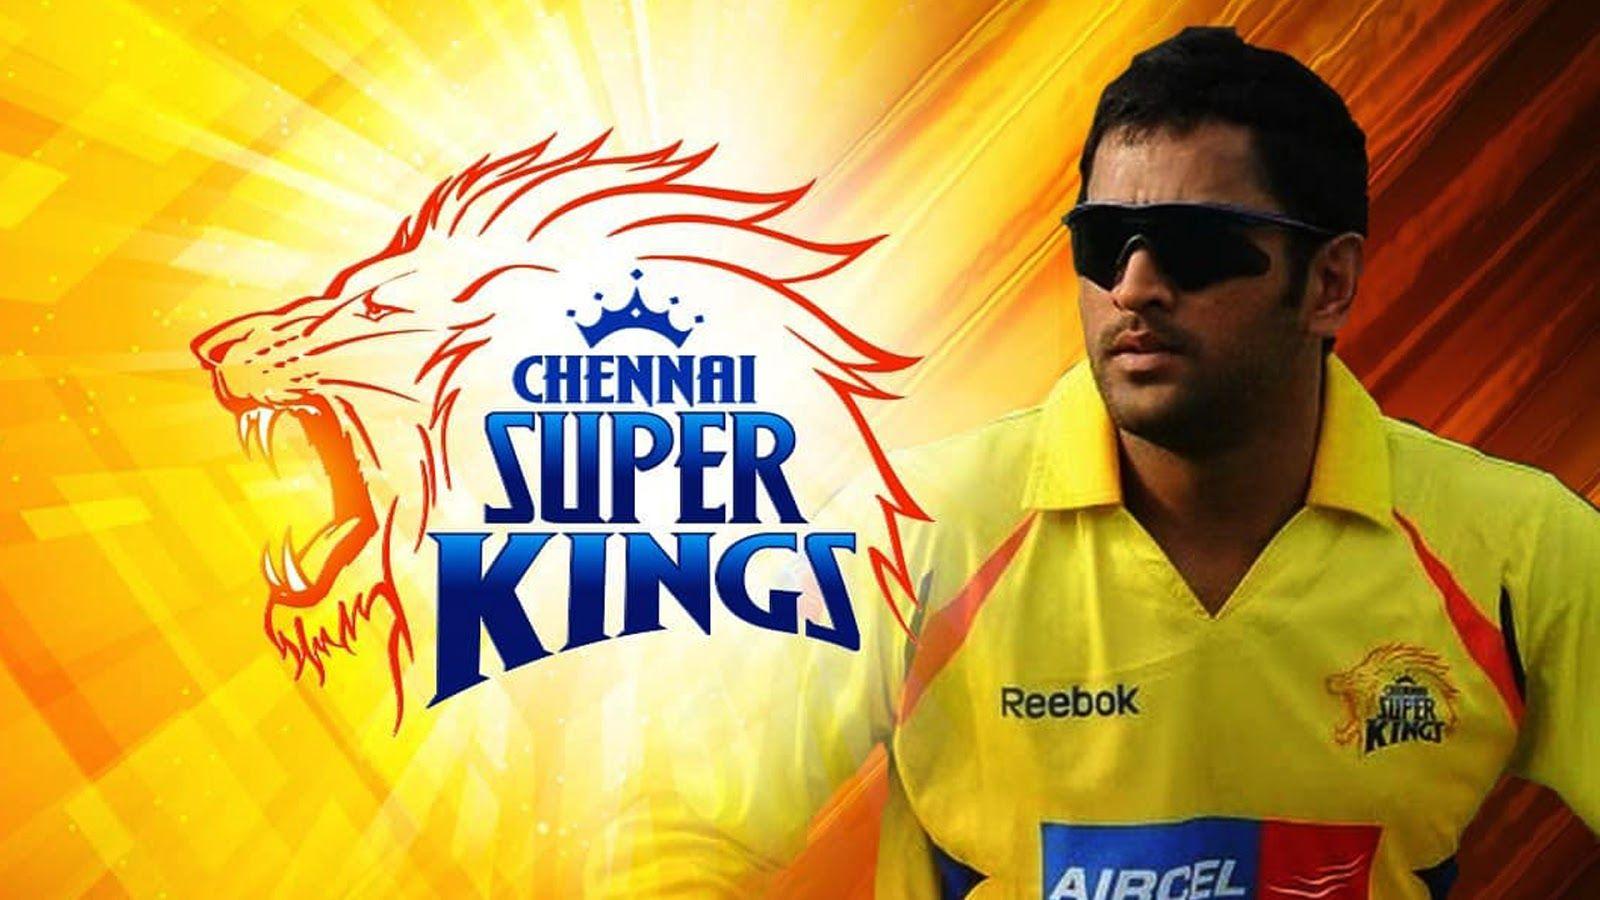 Chennai Super Kings HD Wallpapers Download Free 1080p